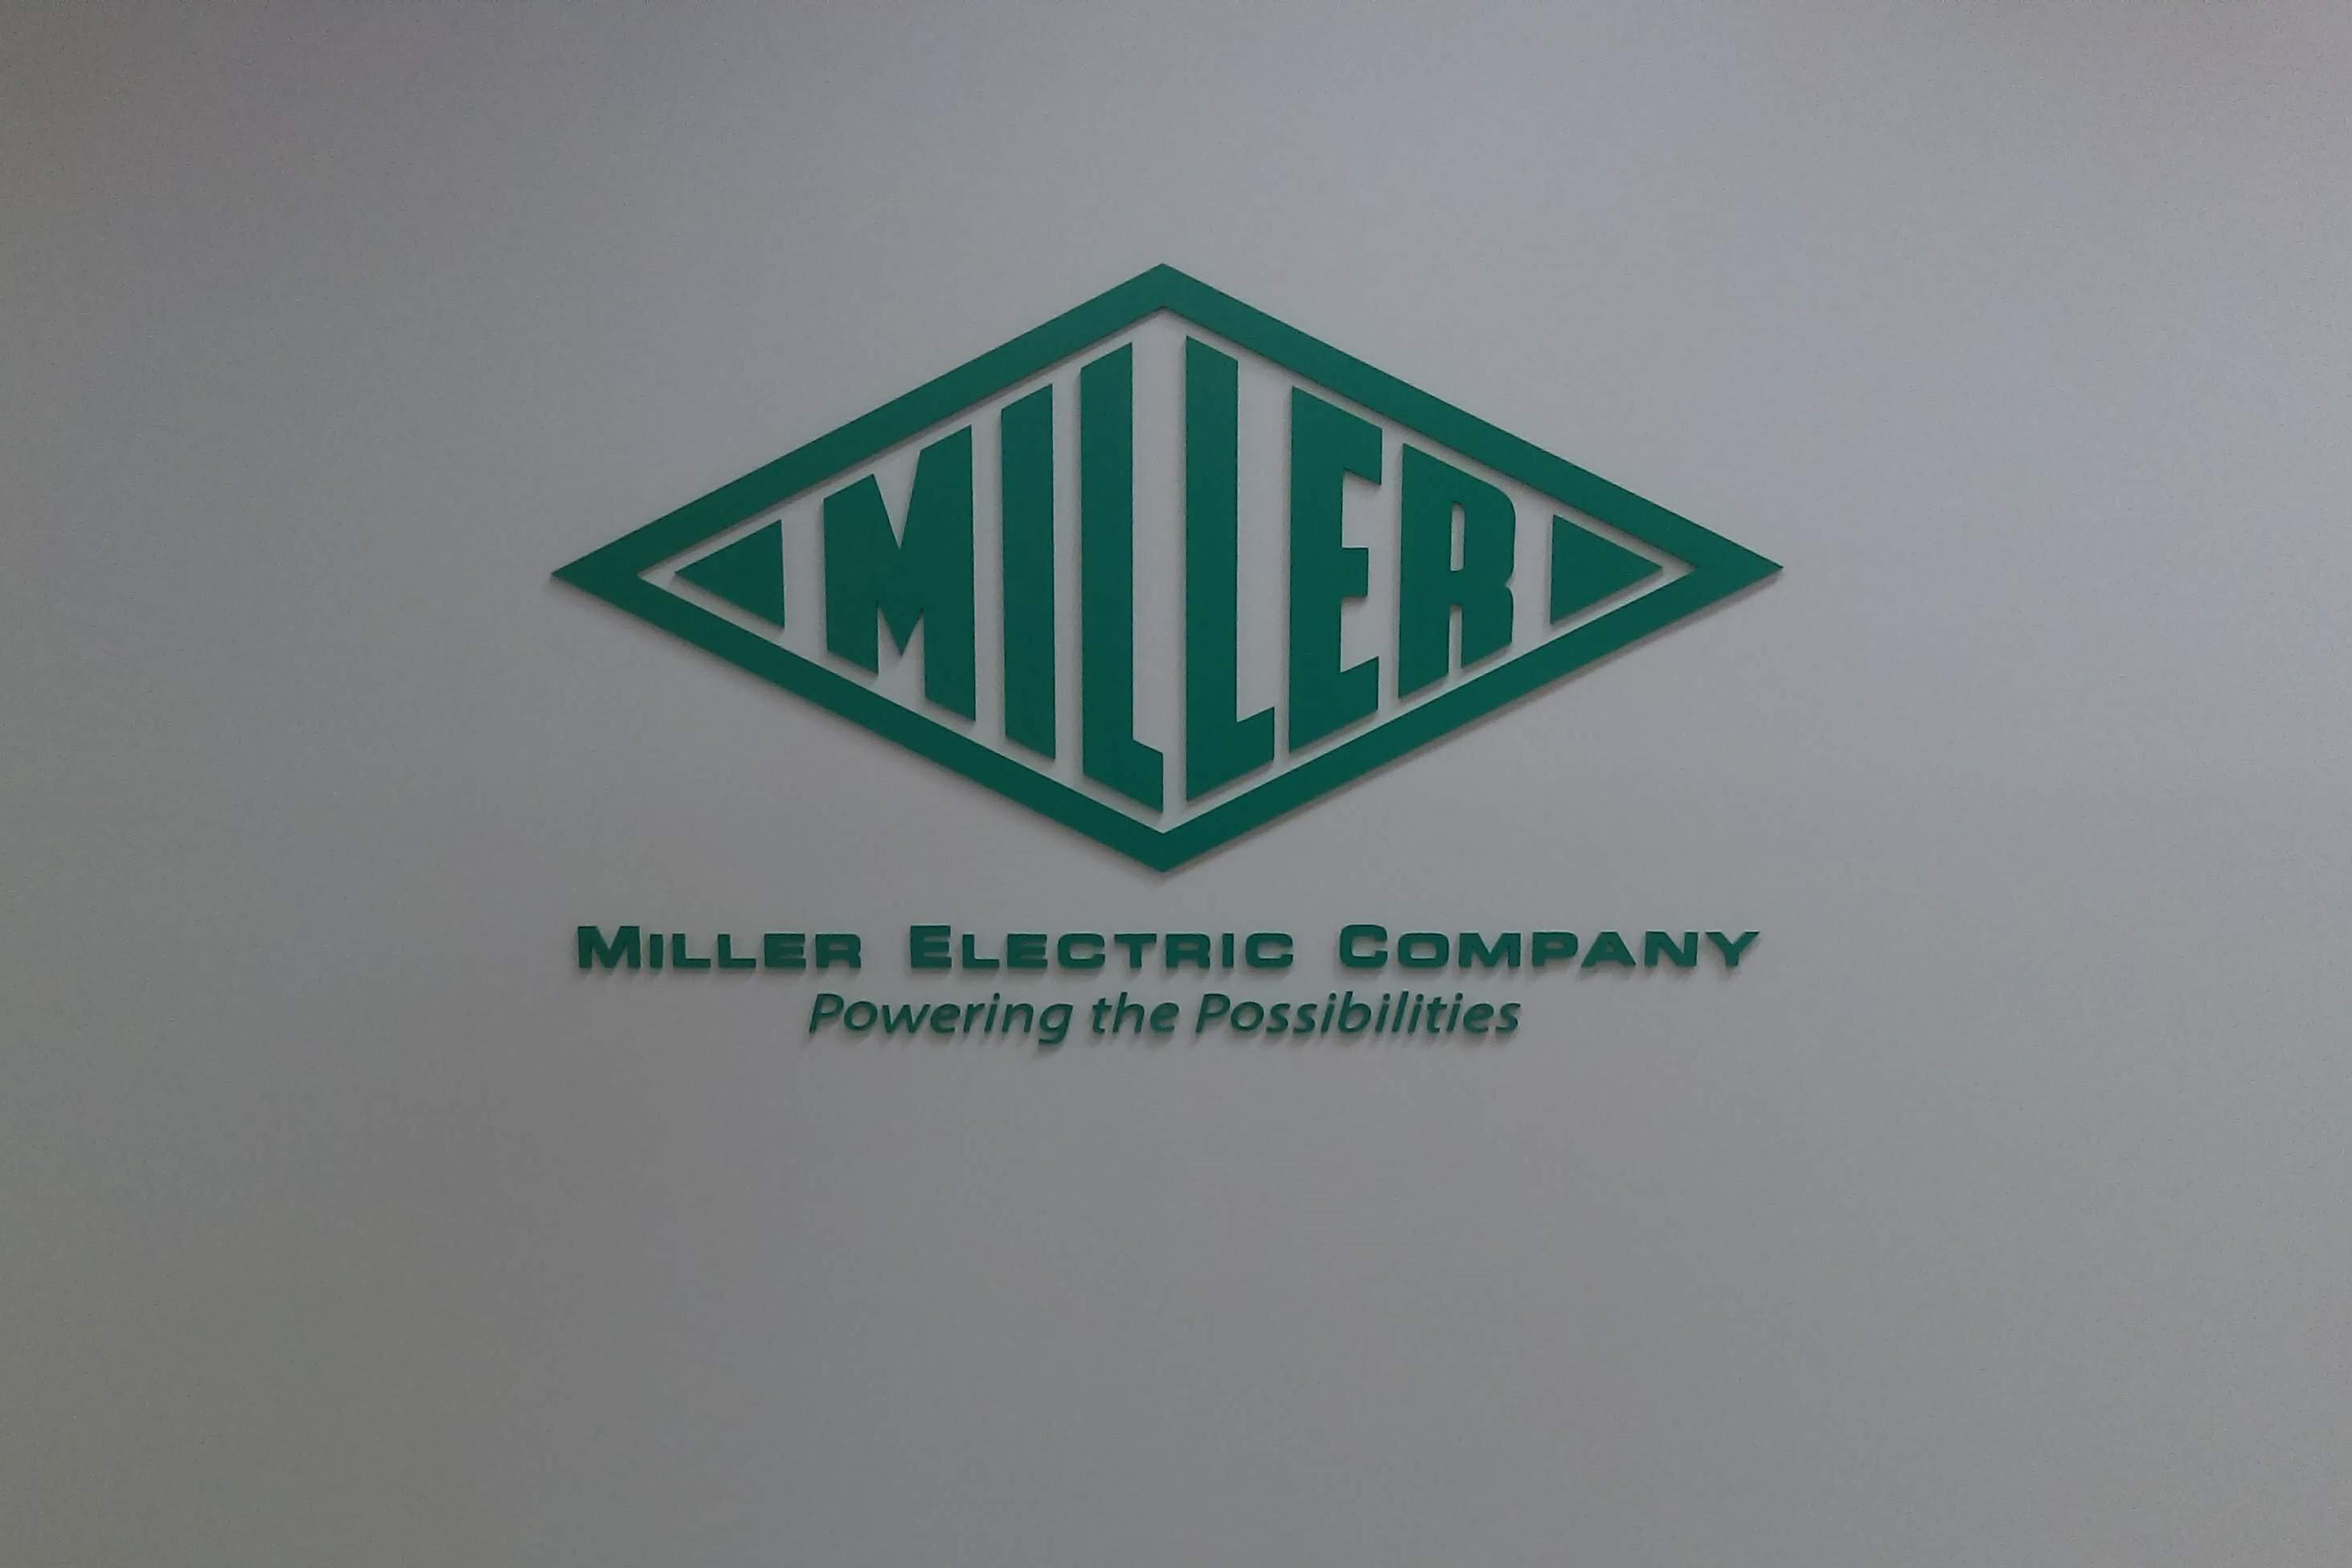 IMAG1605cmiller interior green logo